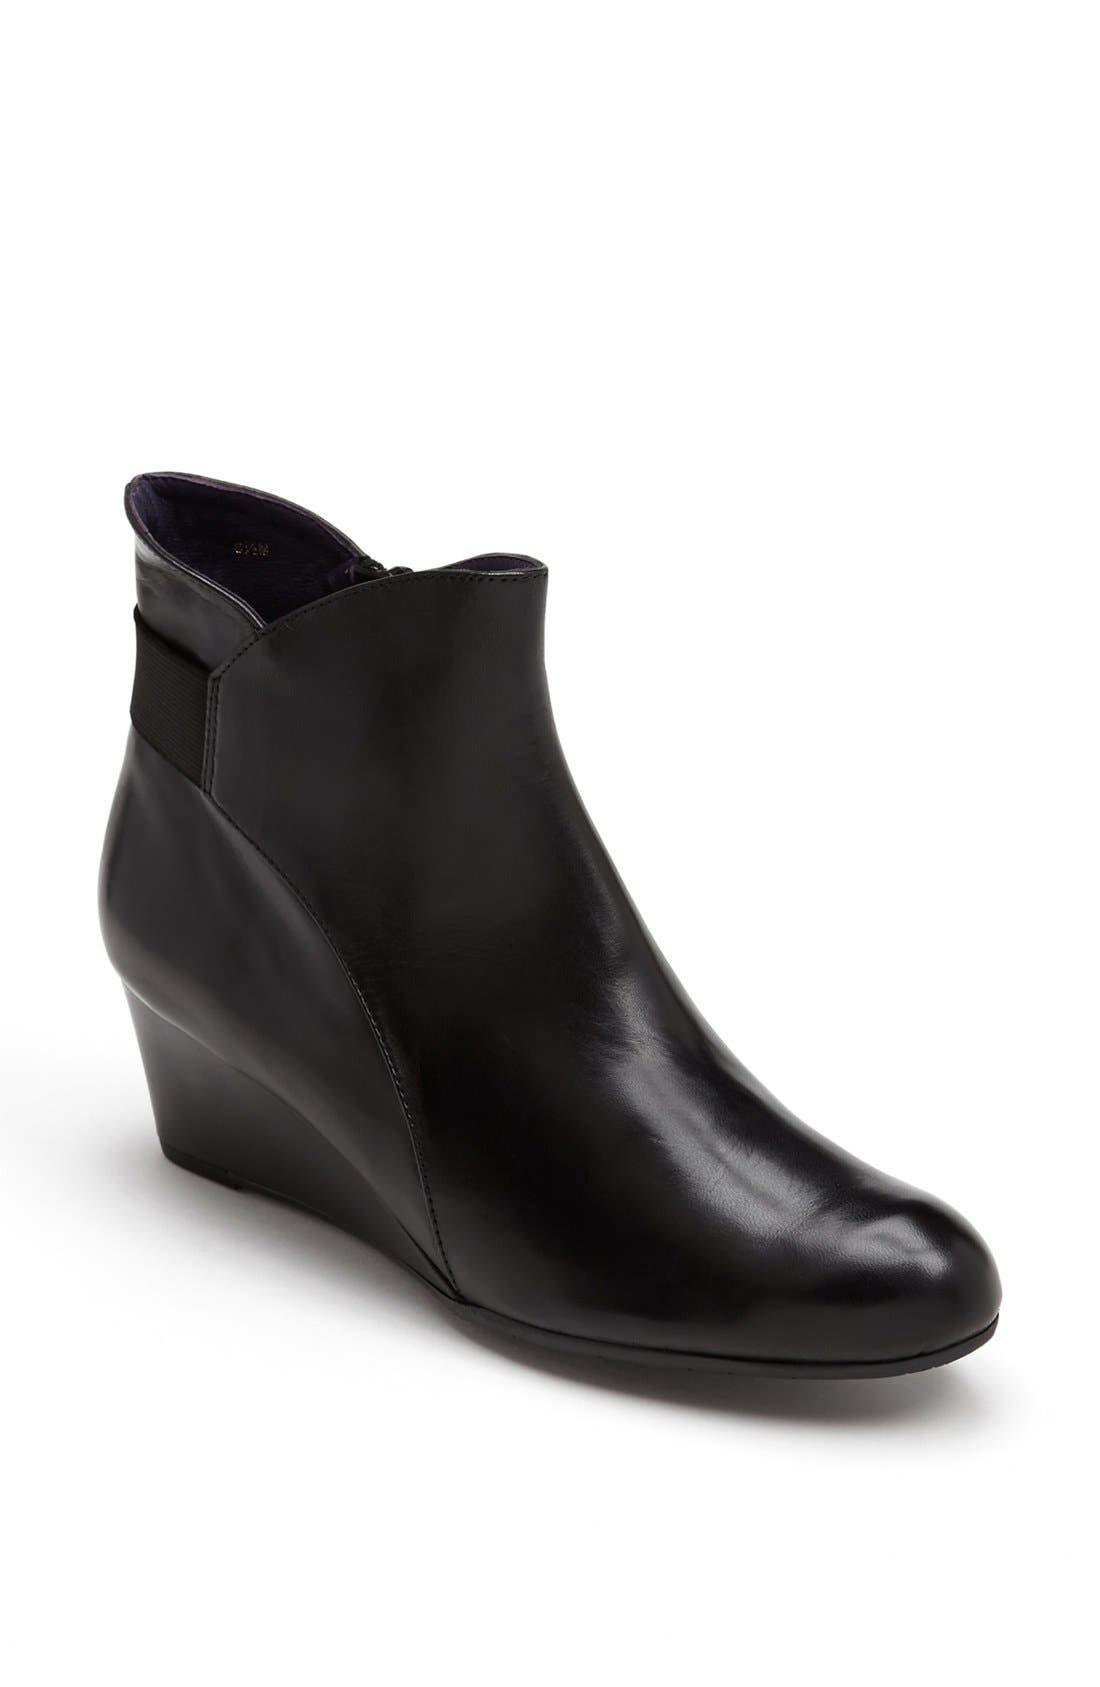 Main Image - VANELi 'Lana' Boot